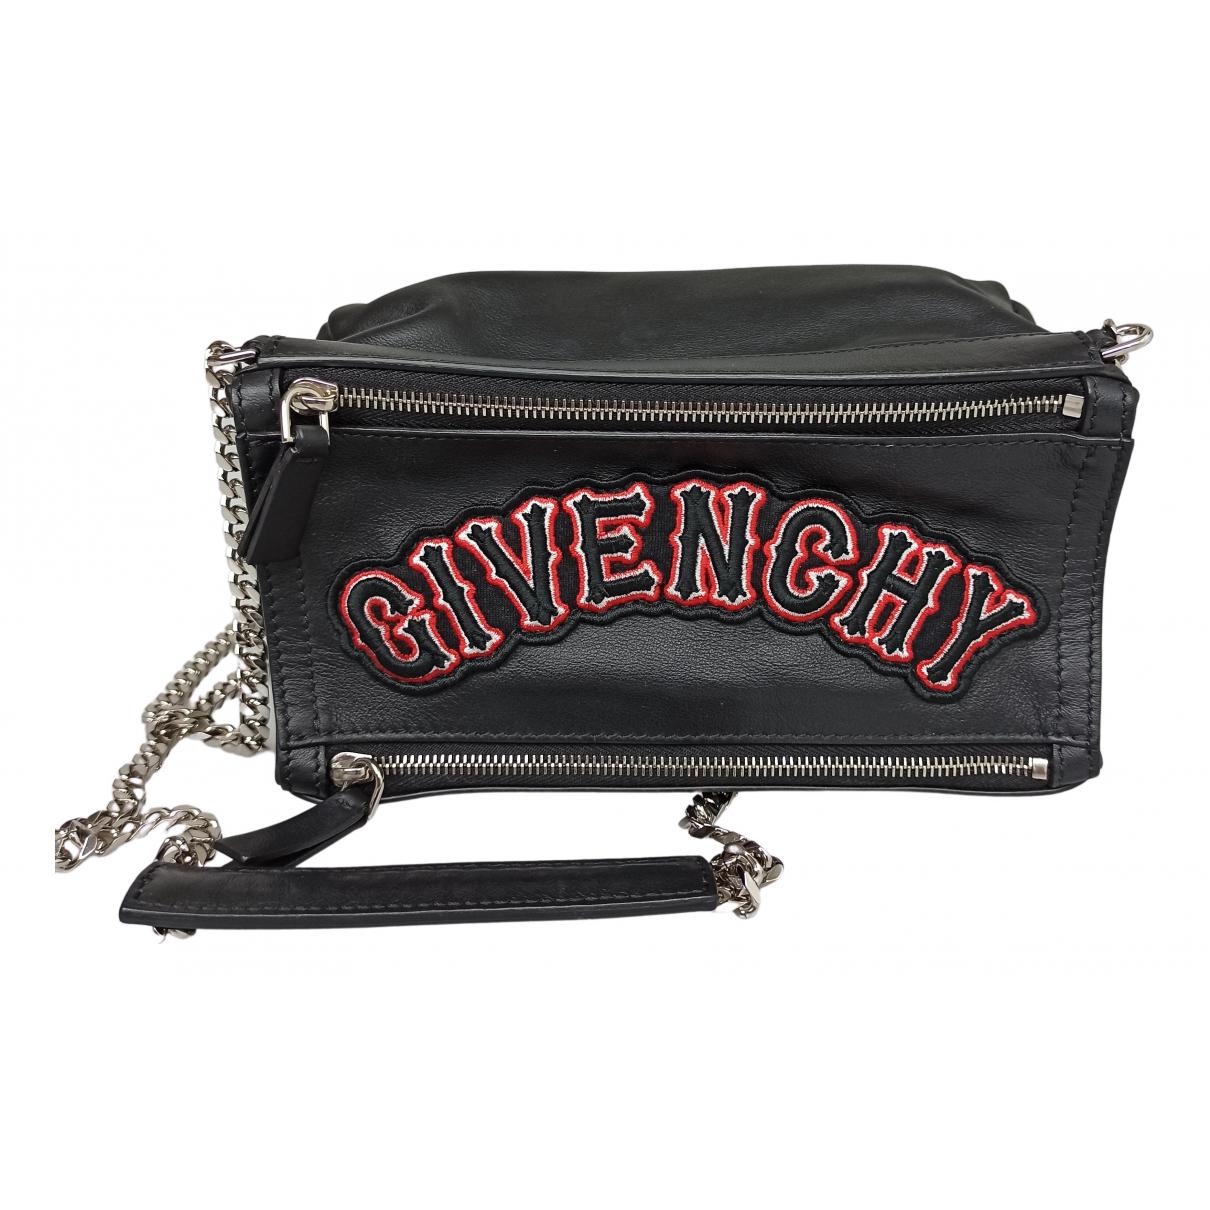 Givenchy Pandora Black Leather handbag for Women N